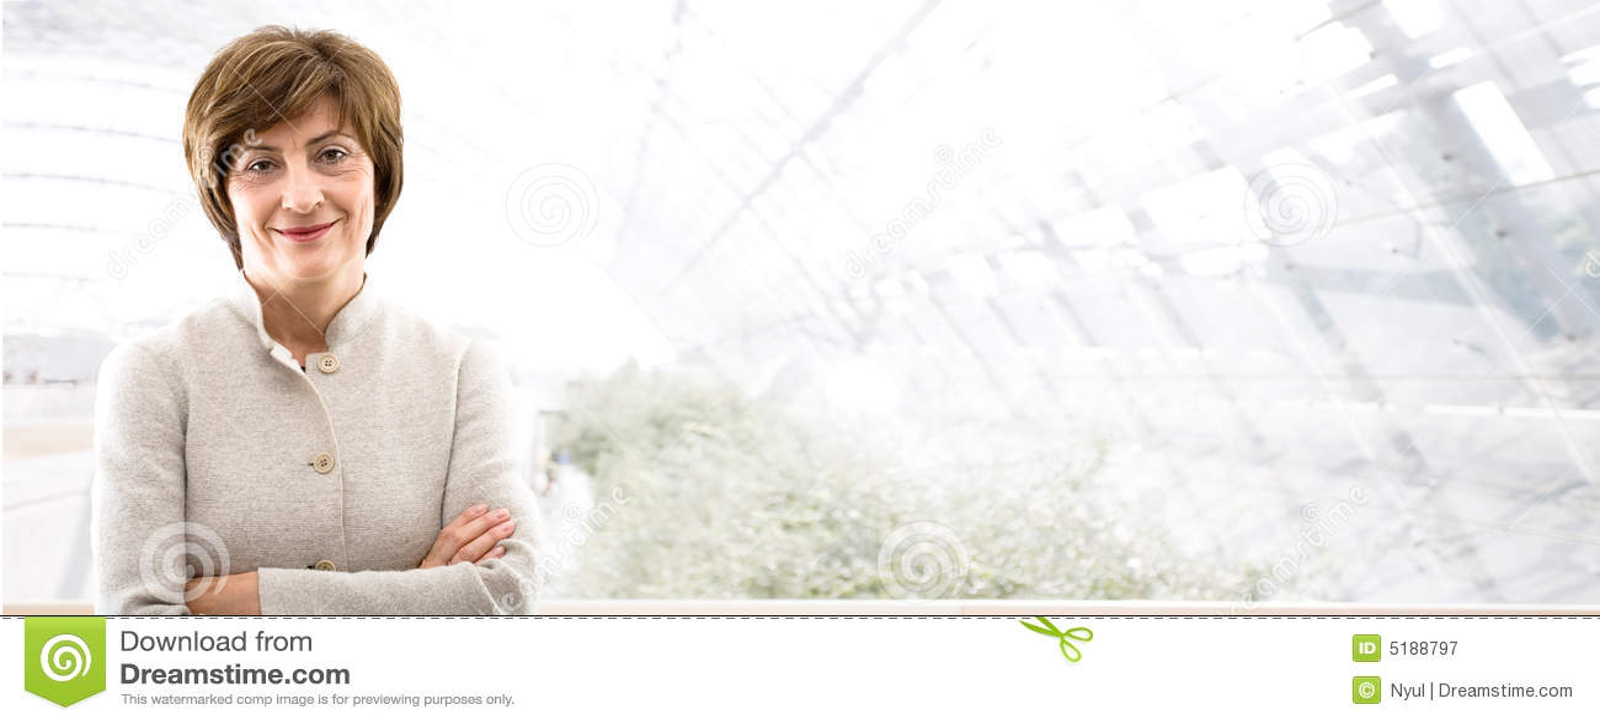 Business banner - senior businesswoman